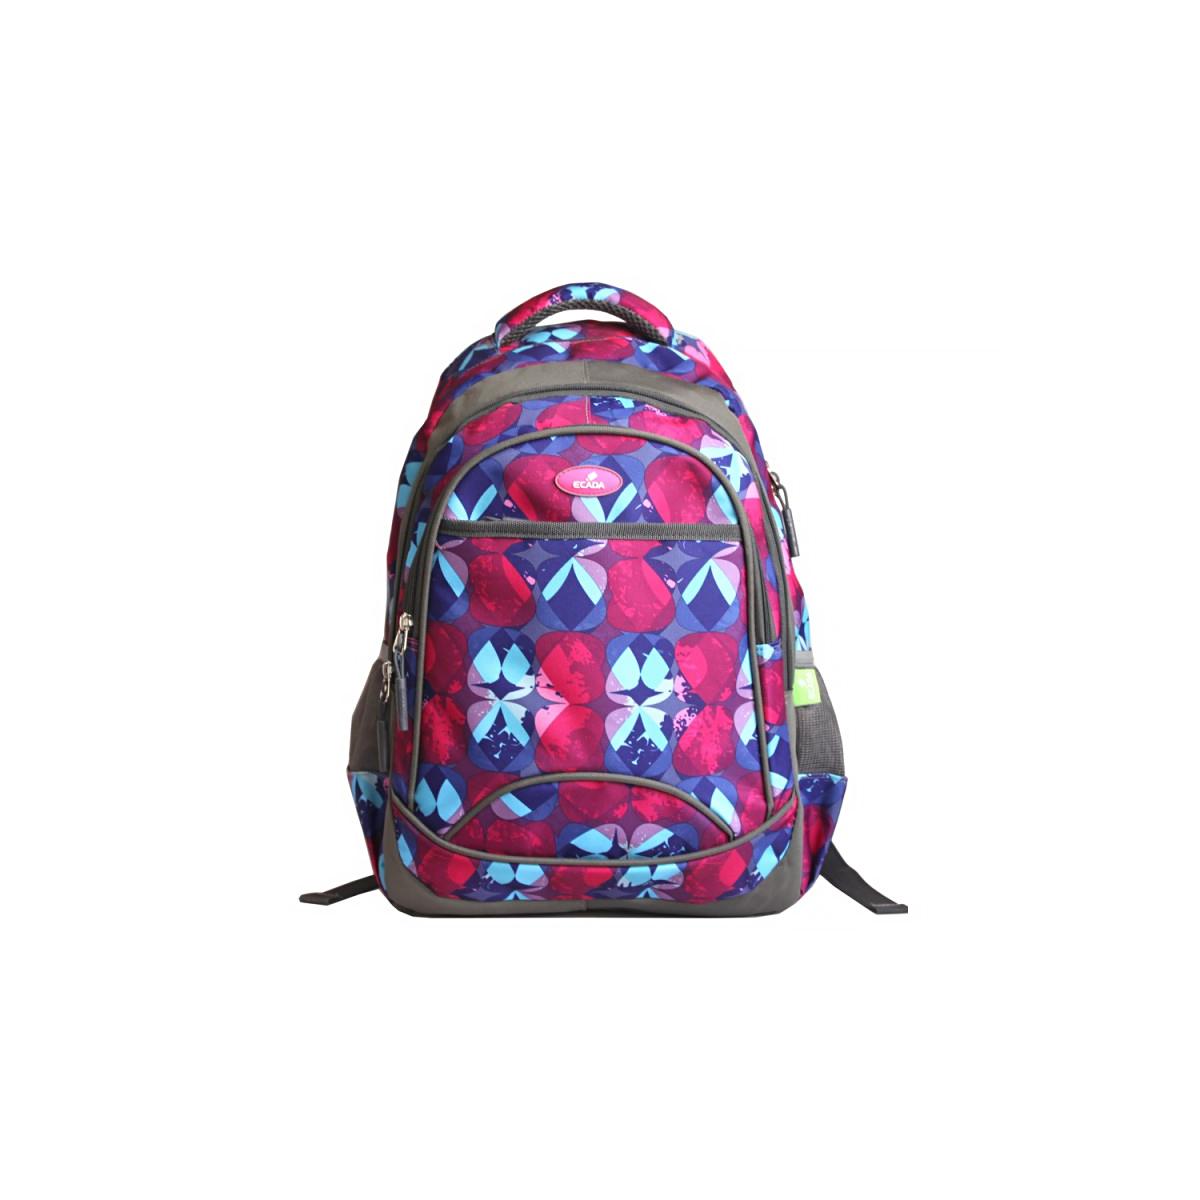 Ghiozdan Școlar Pentru Adolescenți, Multicolor, Flori Abstract, Ecada, 61408